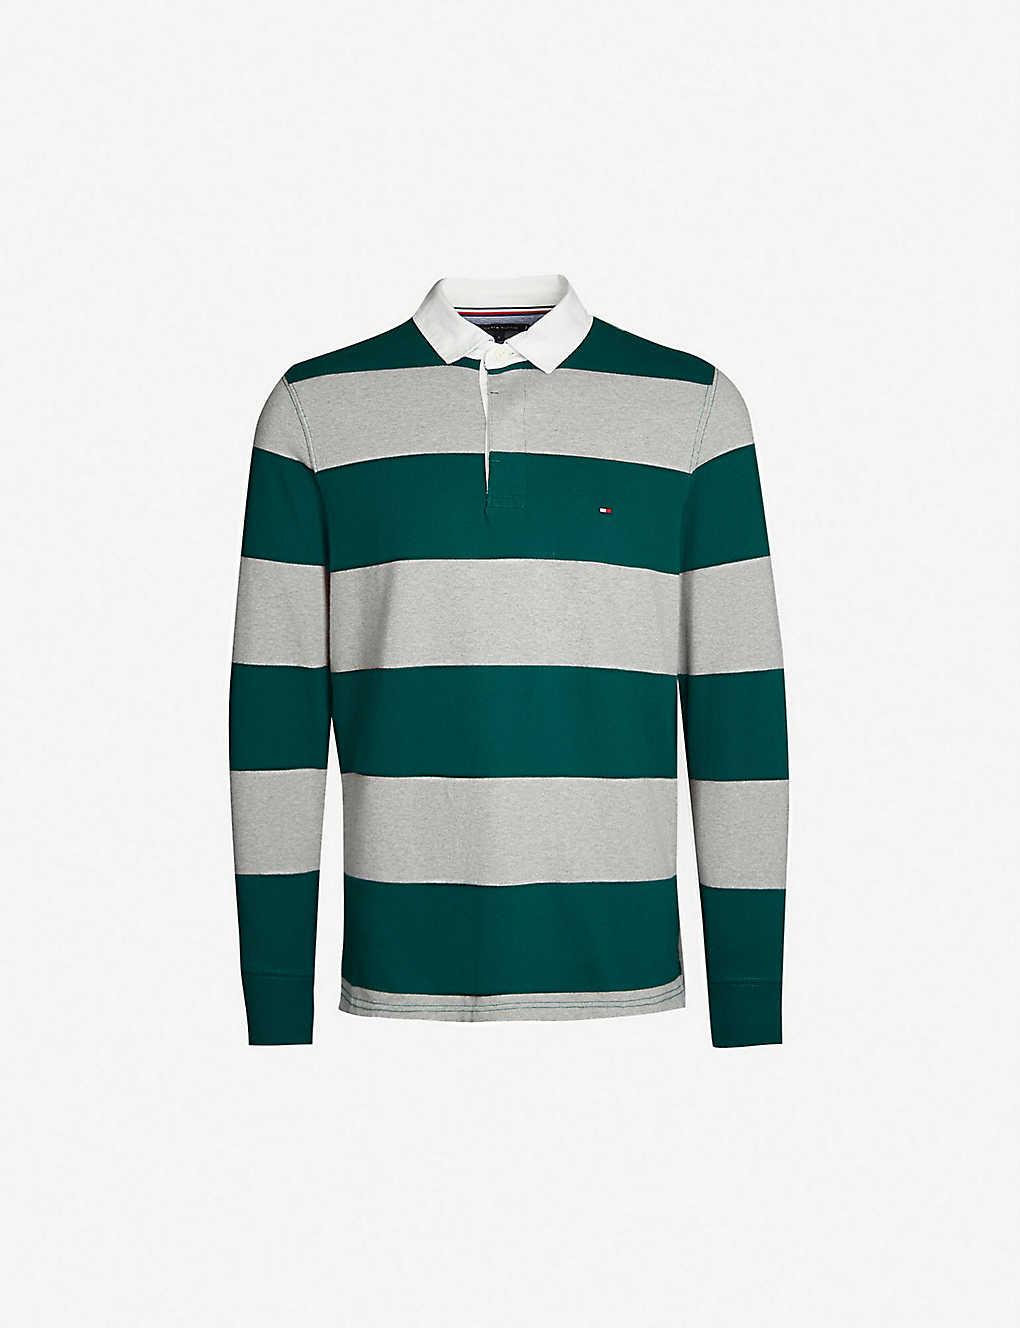 c6e5ebf82 TOMMY HILFIGER - Striped cotton-jersey rugby shirt | Selfridges.com